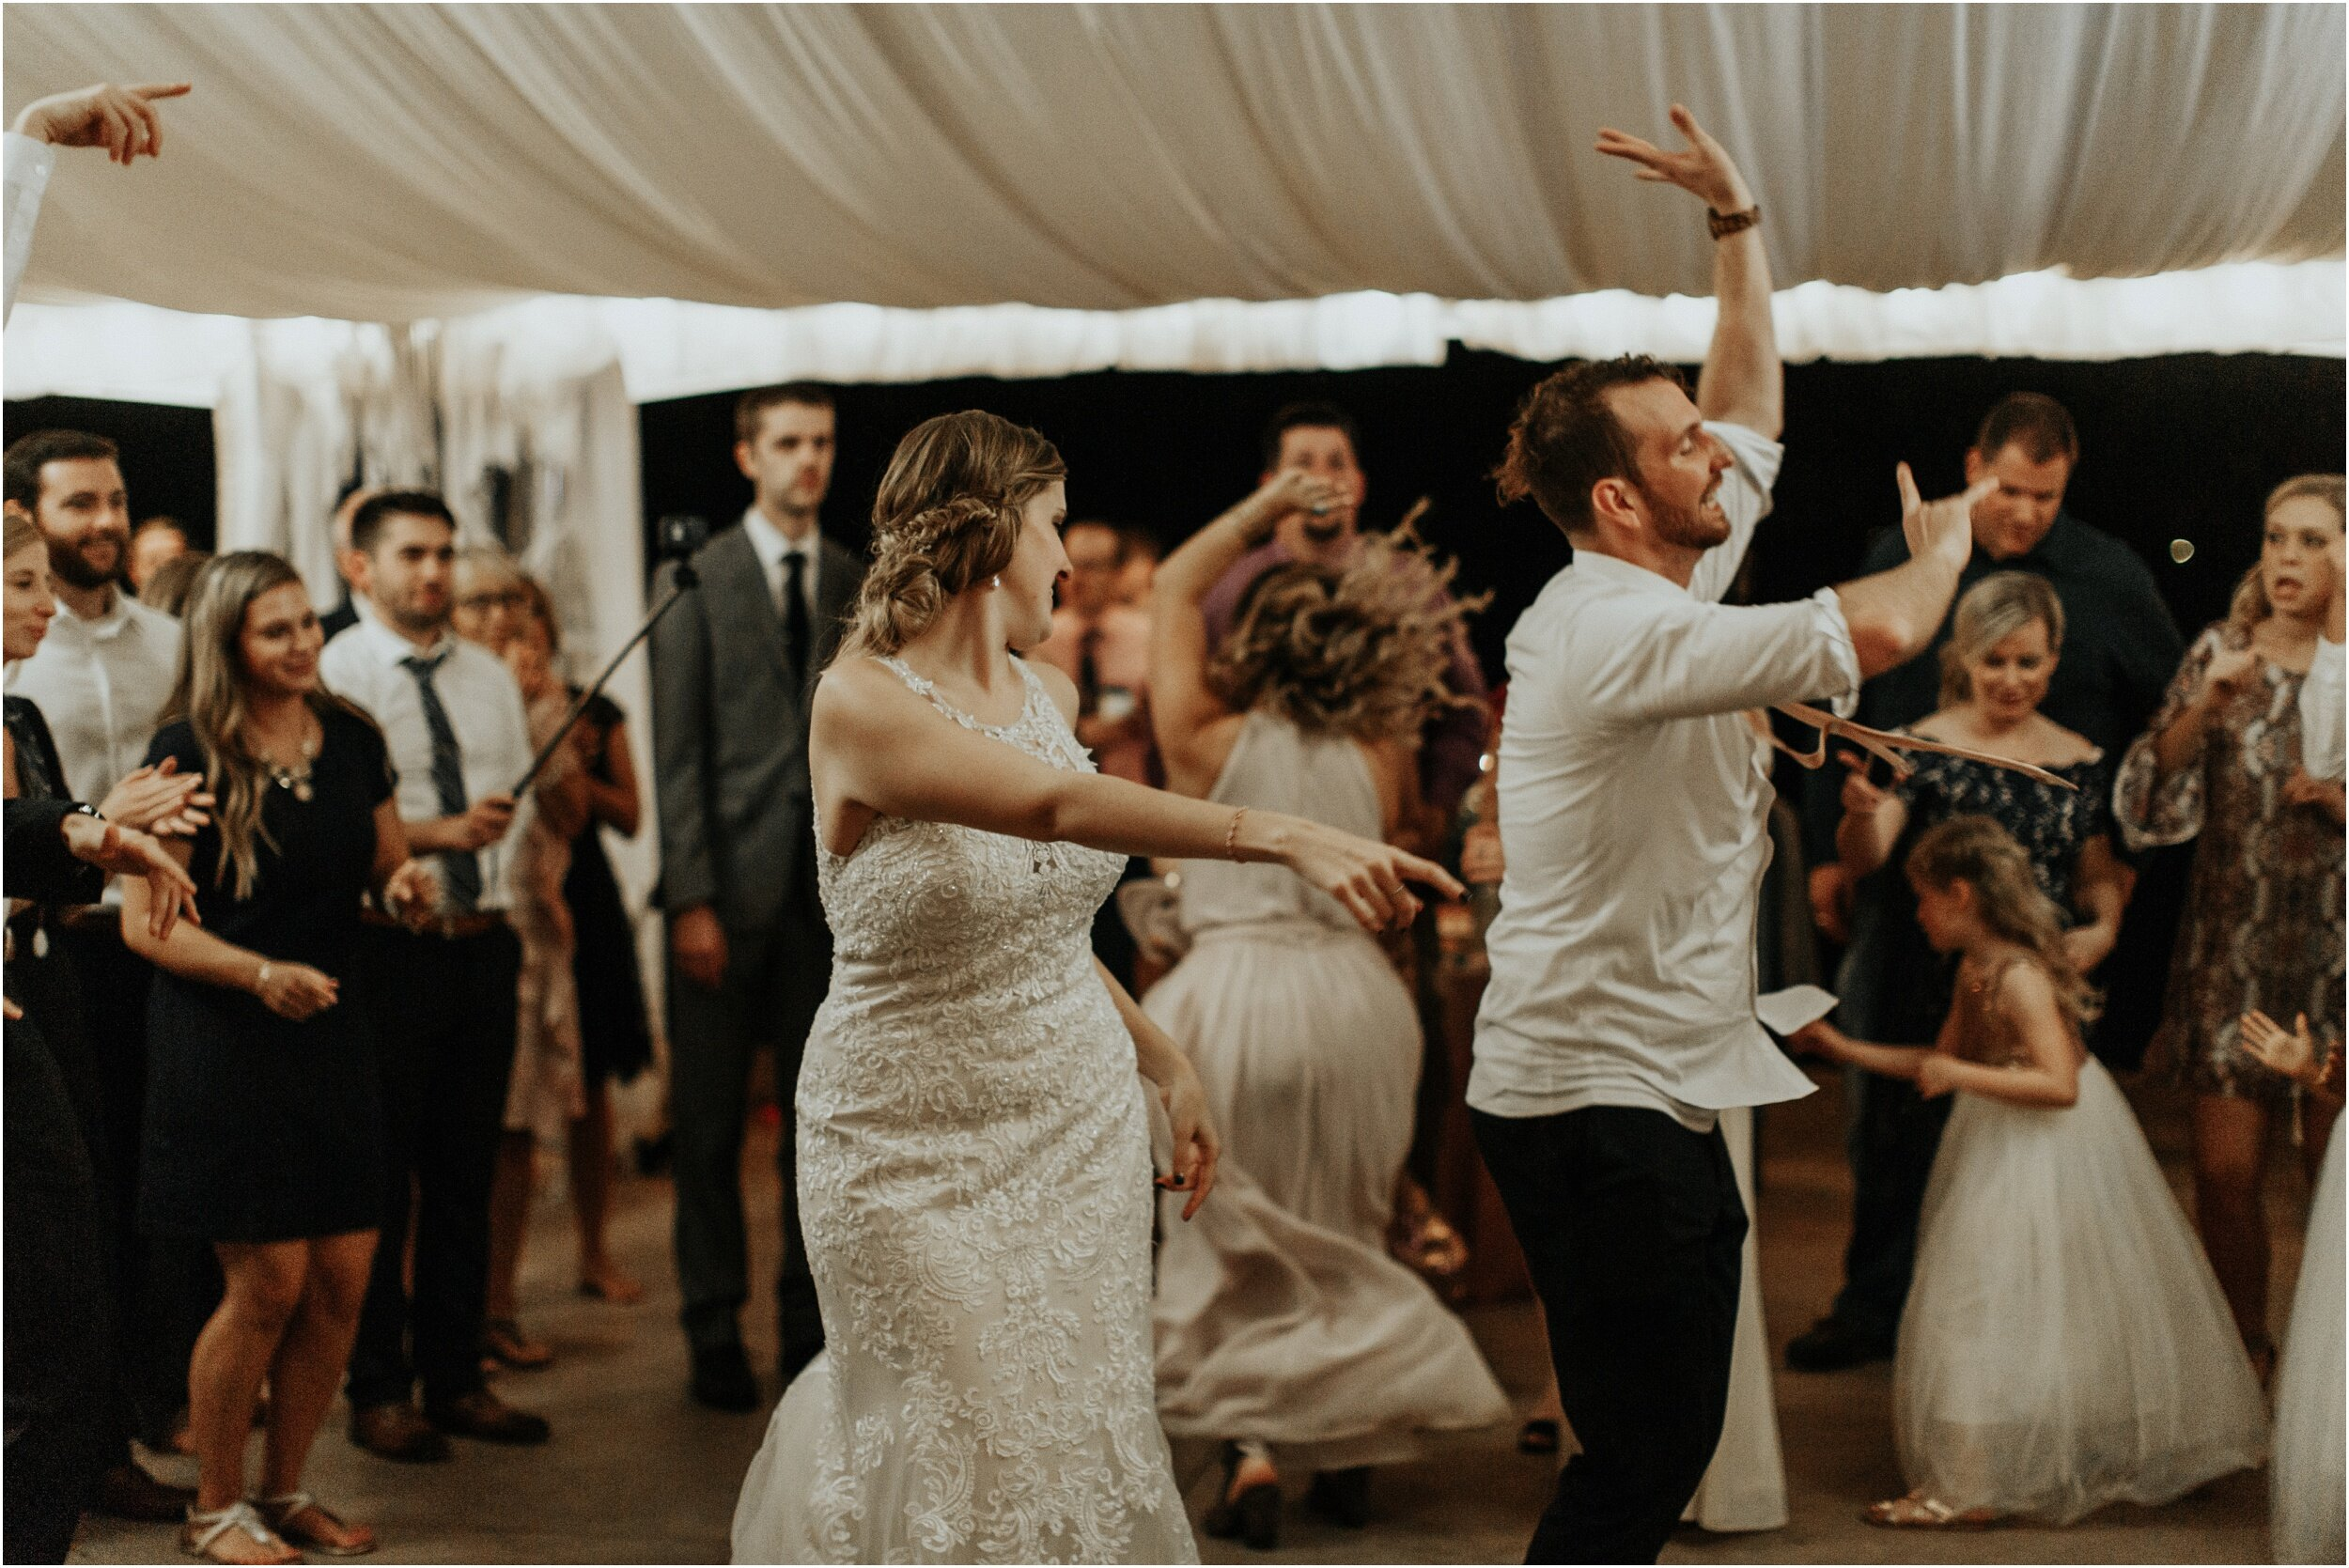 steph-and-jordan-cox-our-wedding-historic-shady-lane-compass-wedding-collective-hazel-lining-photography-destination-elopement-wedding-engagement-photography_0094.jpg